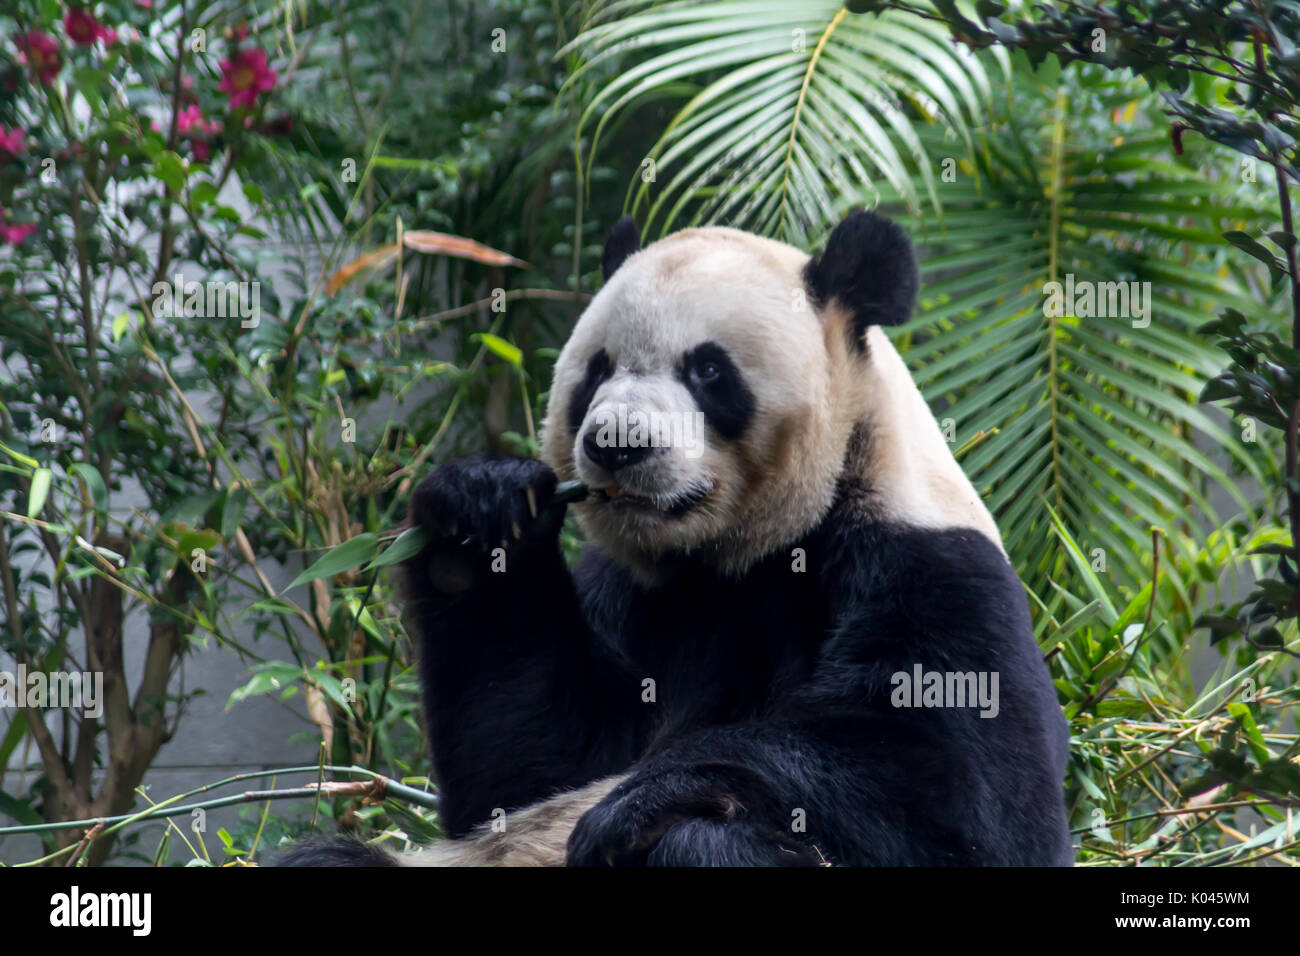 Cute Giant Panda eating bamboo from China Stock Photo